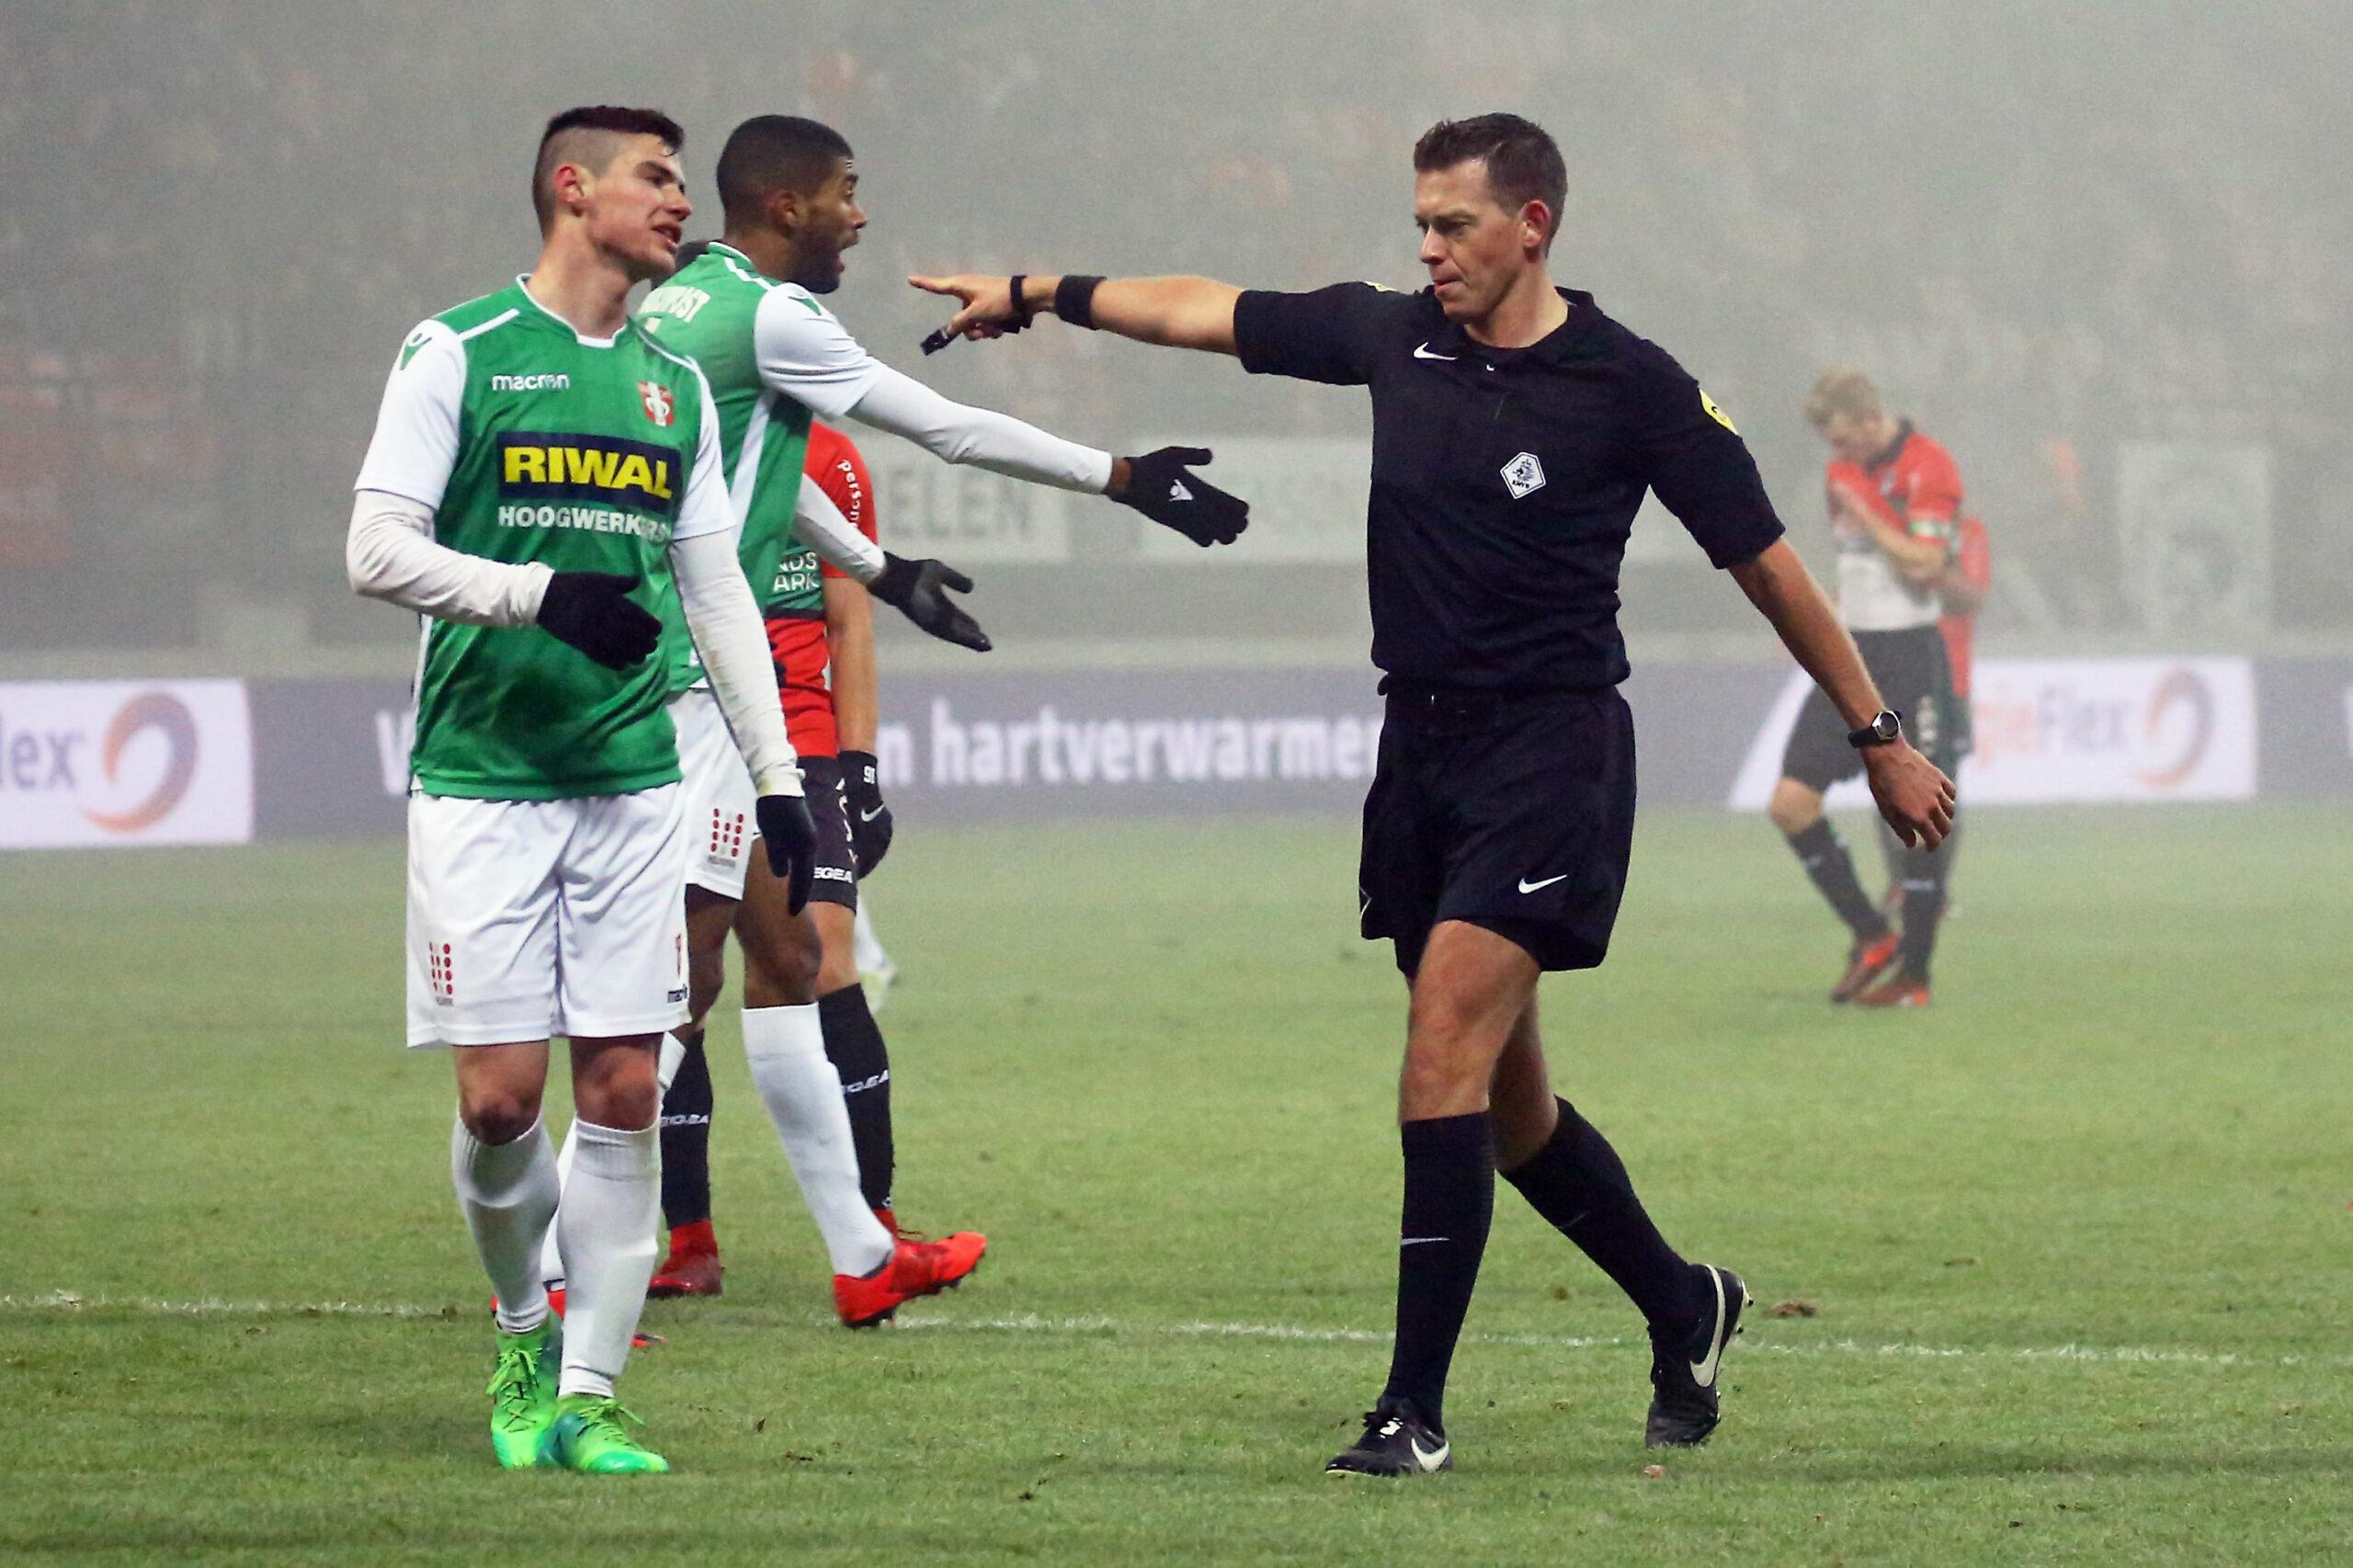 Lindhout scheidsrechter bij derby NEC – Vitesse